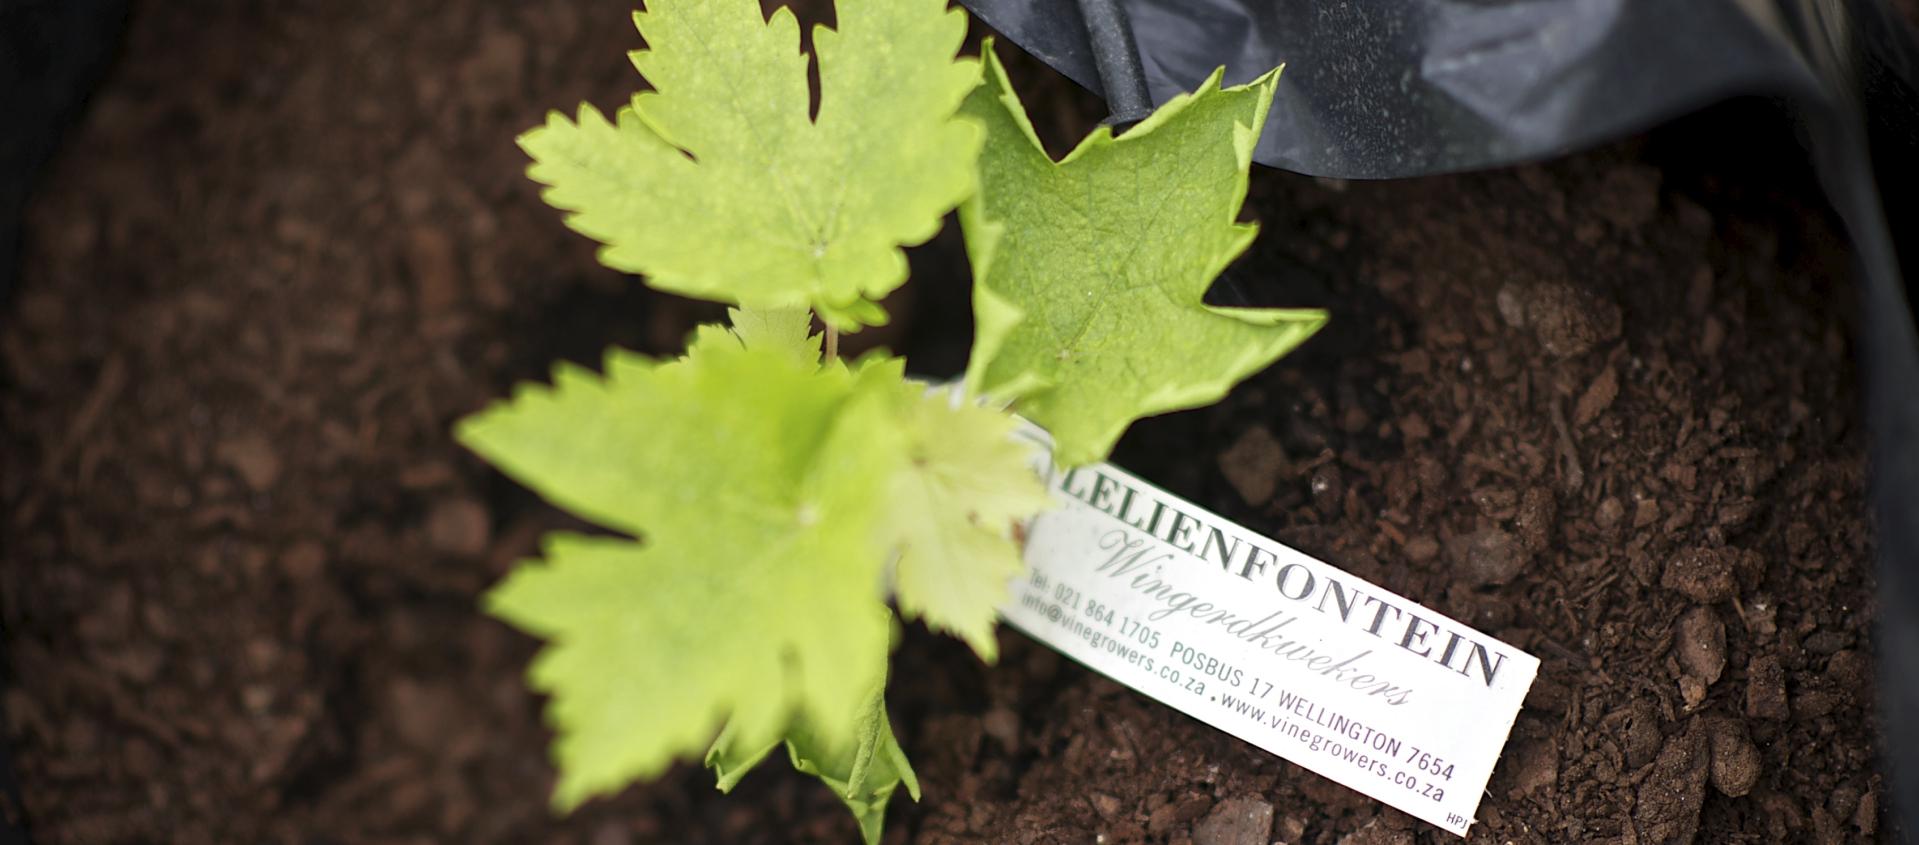 Lelienfontein plantverbetering